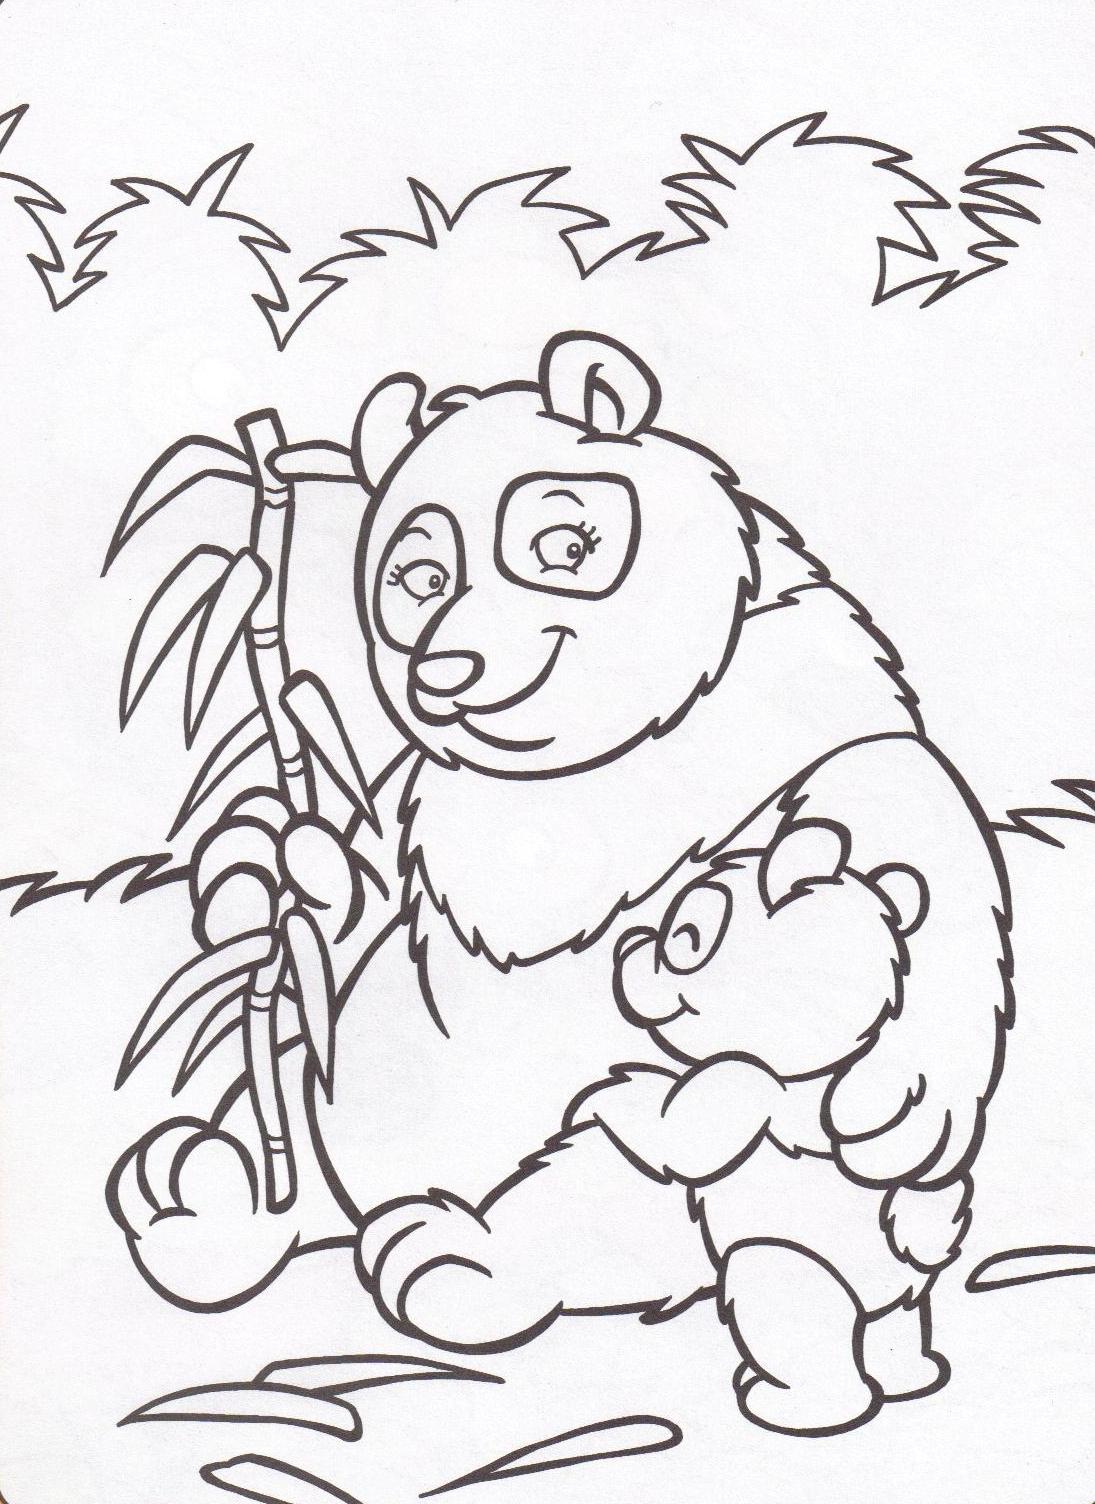 6 dessins de coloriage b b panda imprimer - Panda coloriage ...